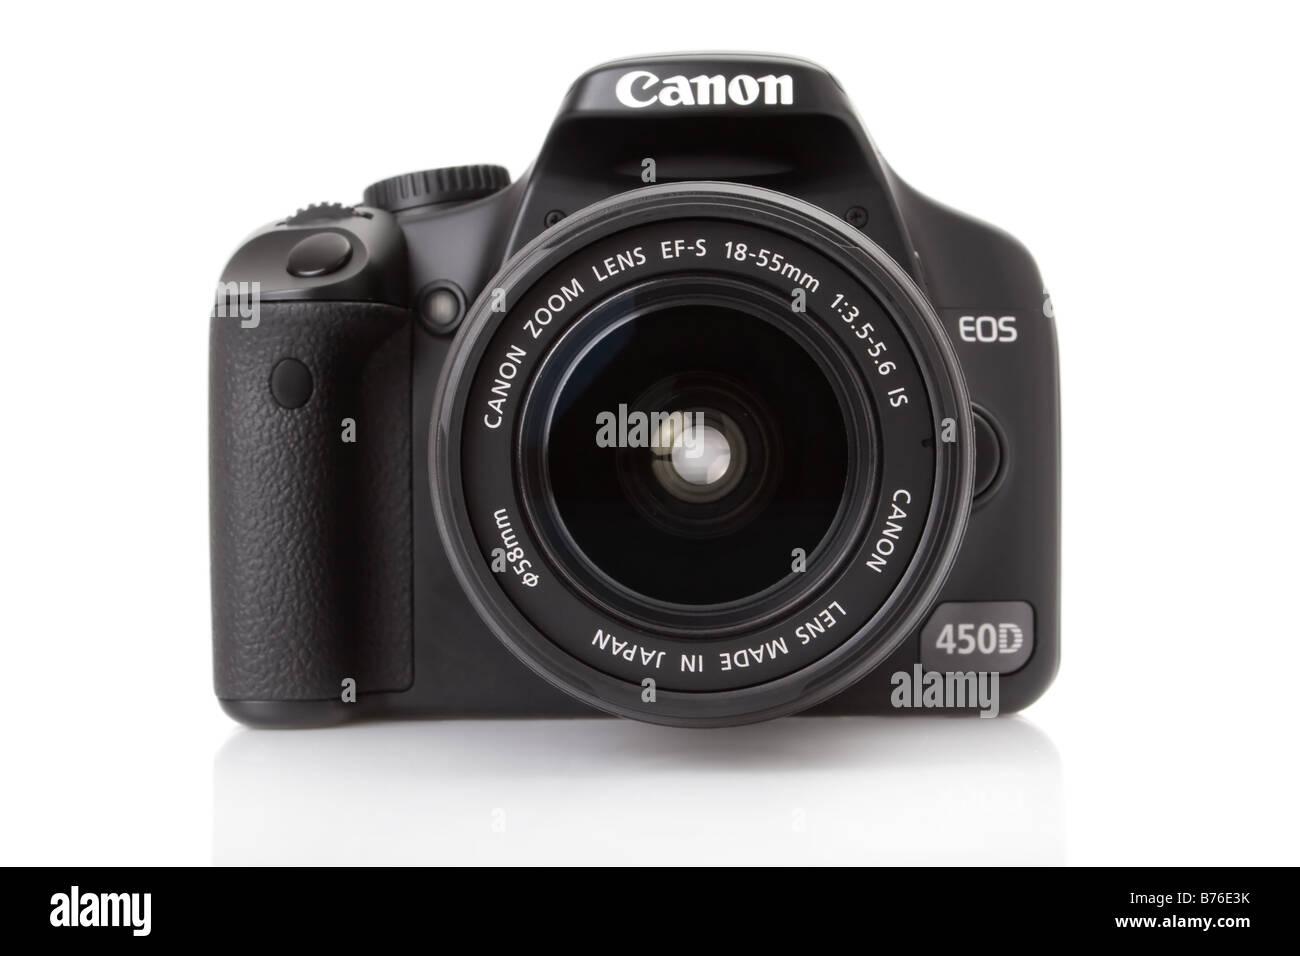 Canon EOS 450D (Rebel XSi), 12 megapixel digital slr, with the 18-55mm kit lens - Stock Image